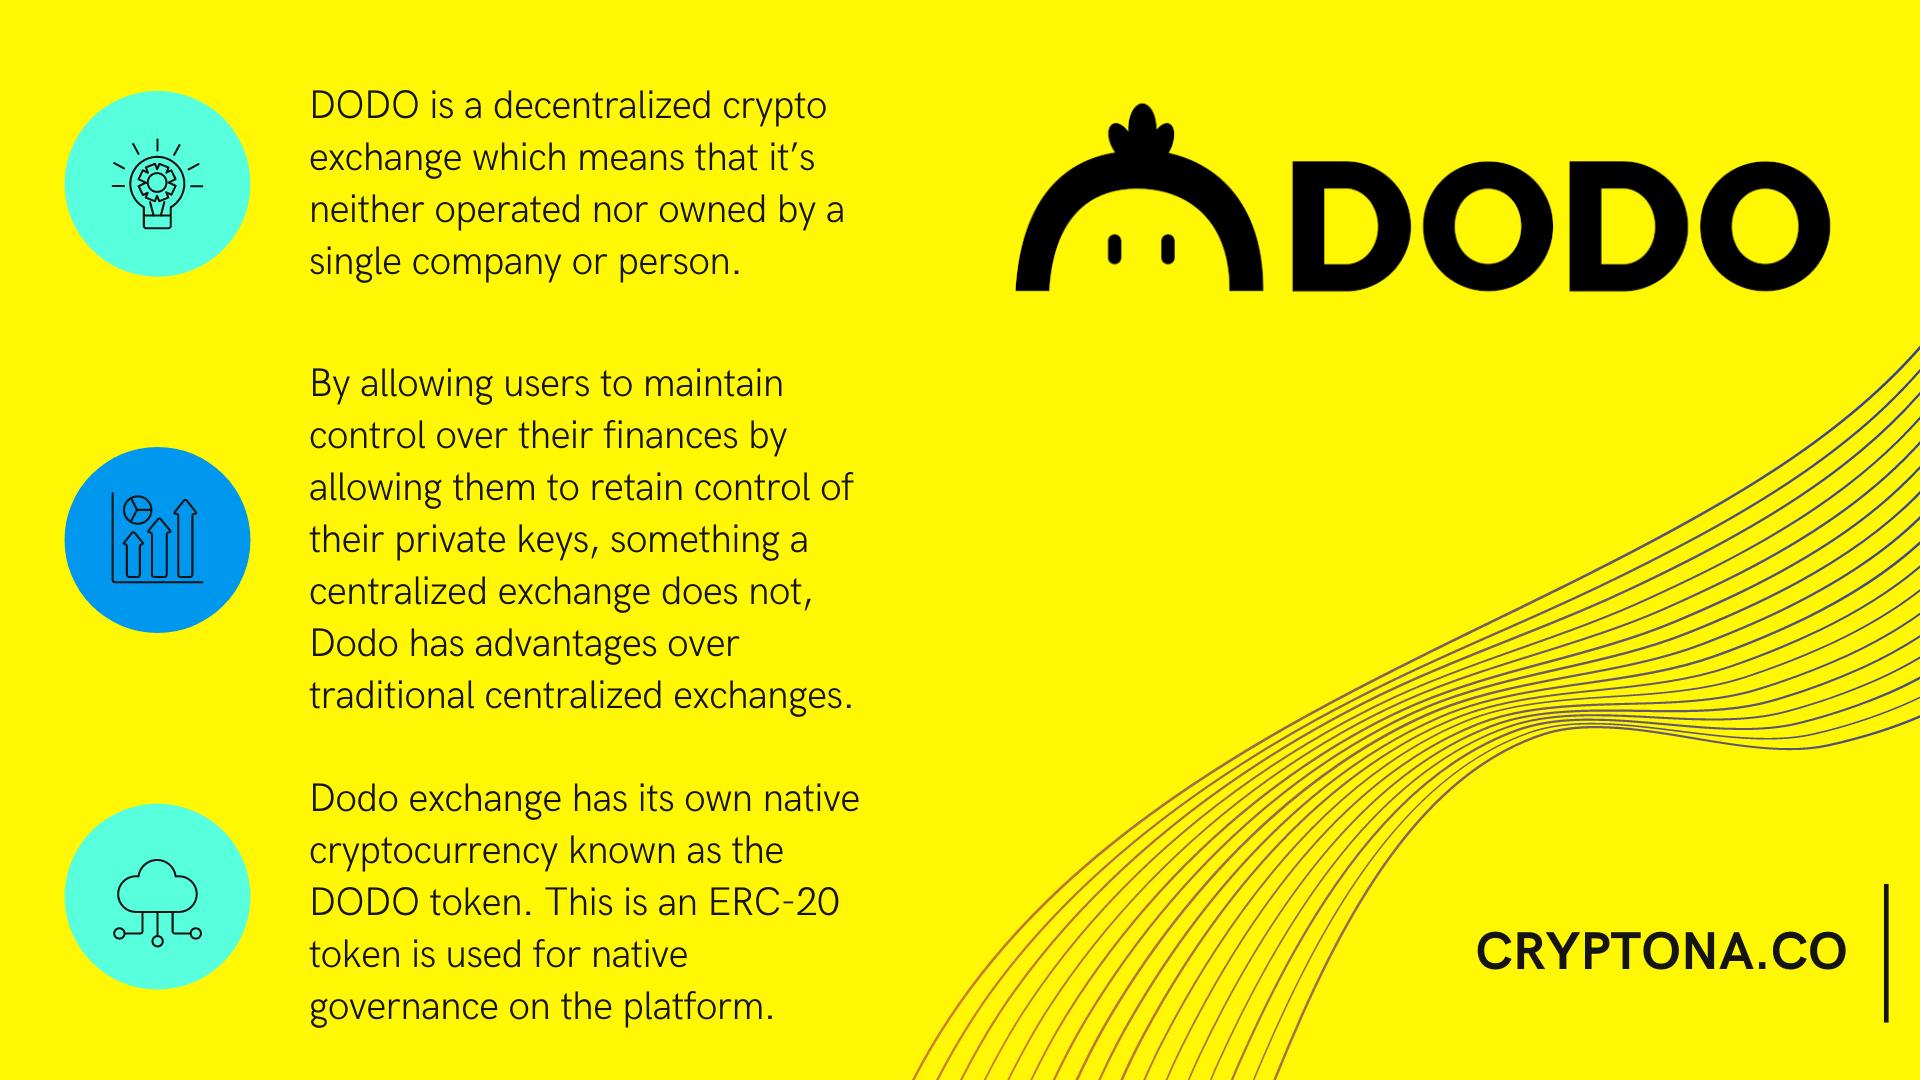 Dodo Coin Price Prediction Forecast 2021-2025